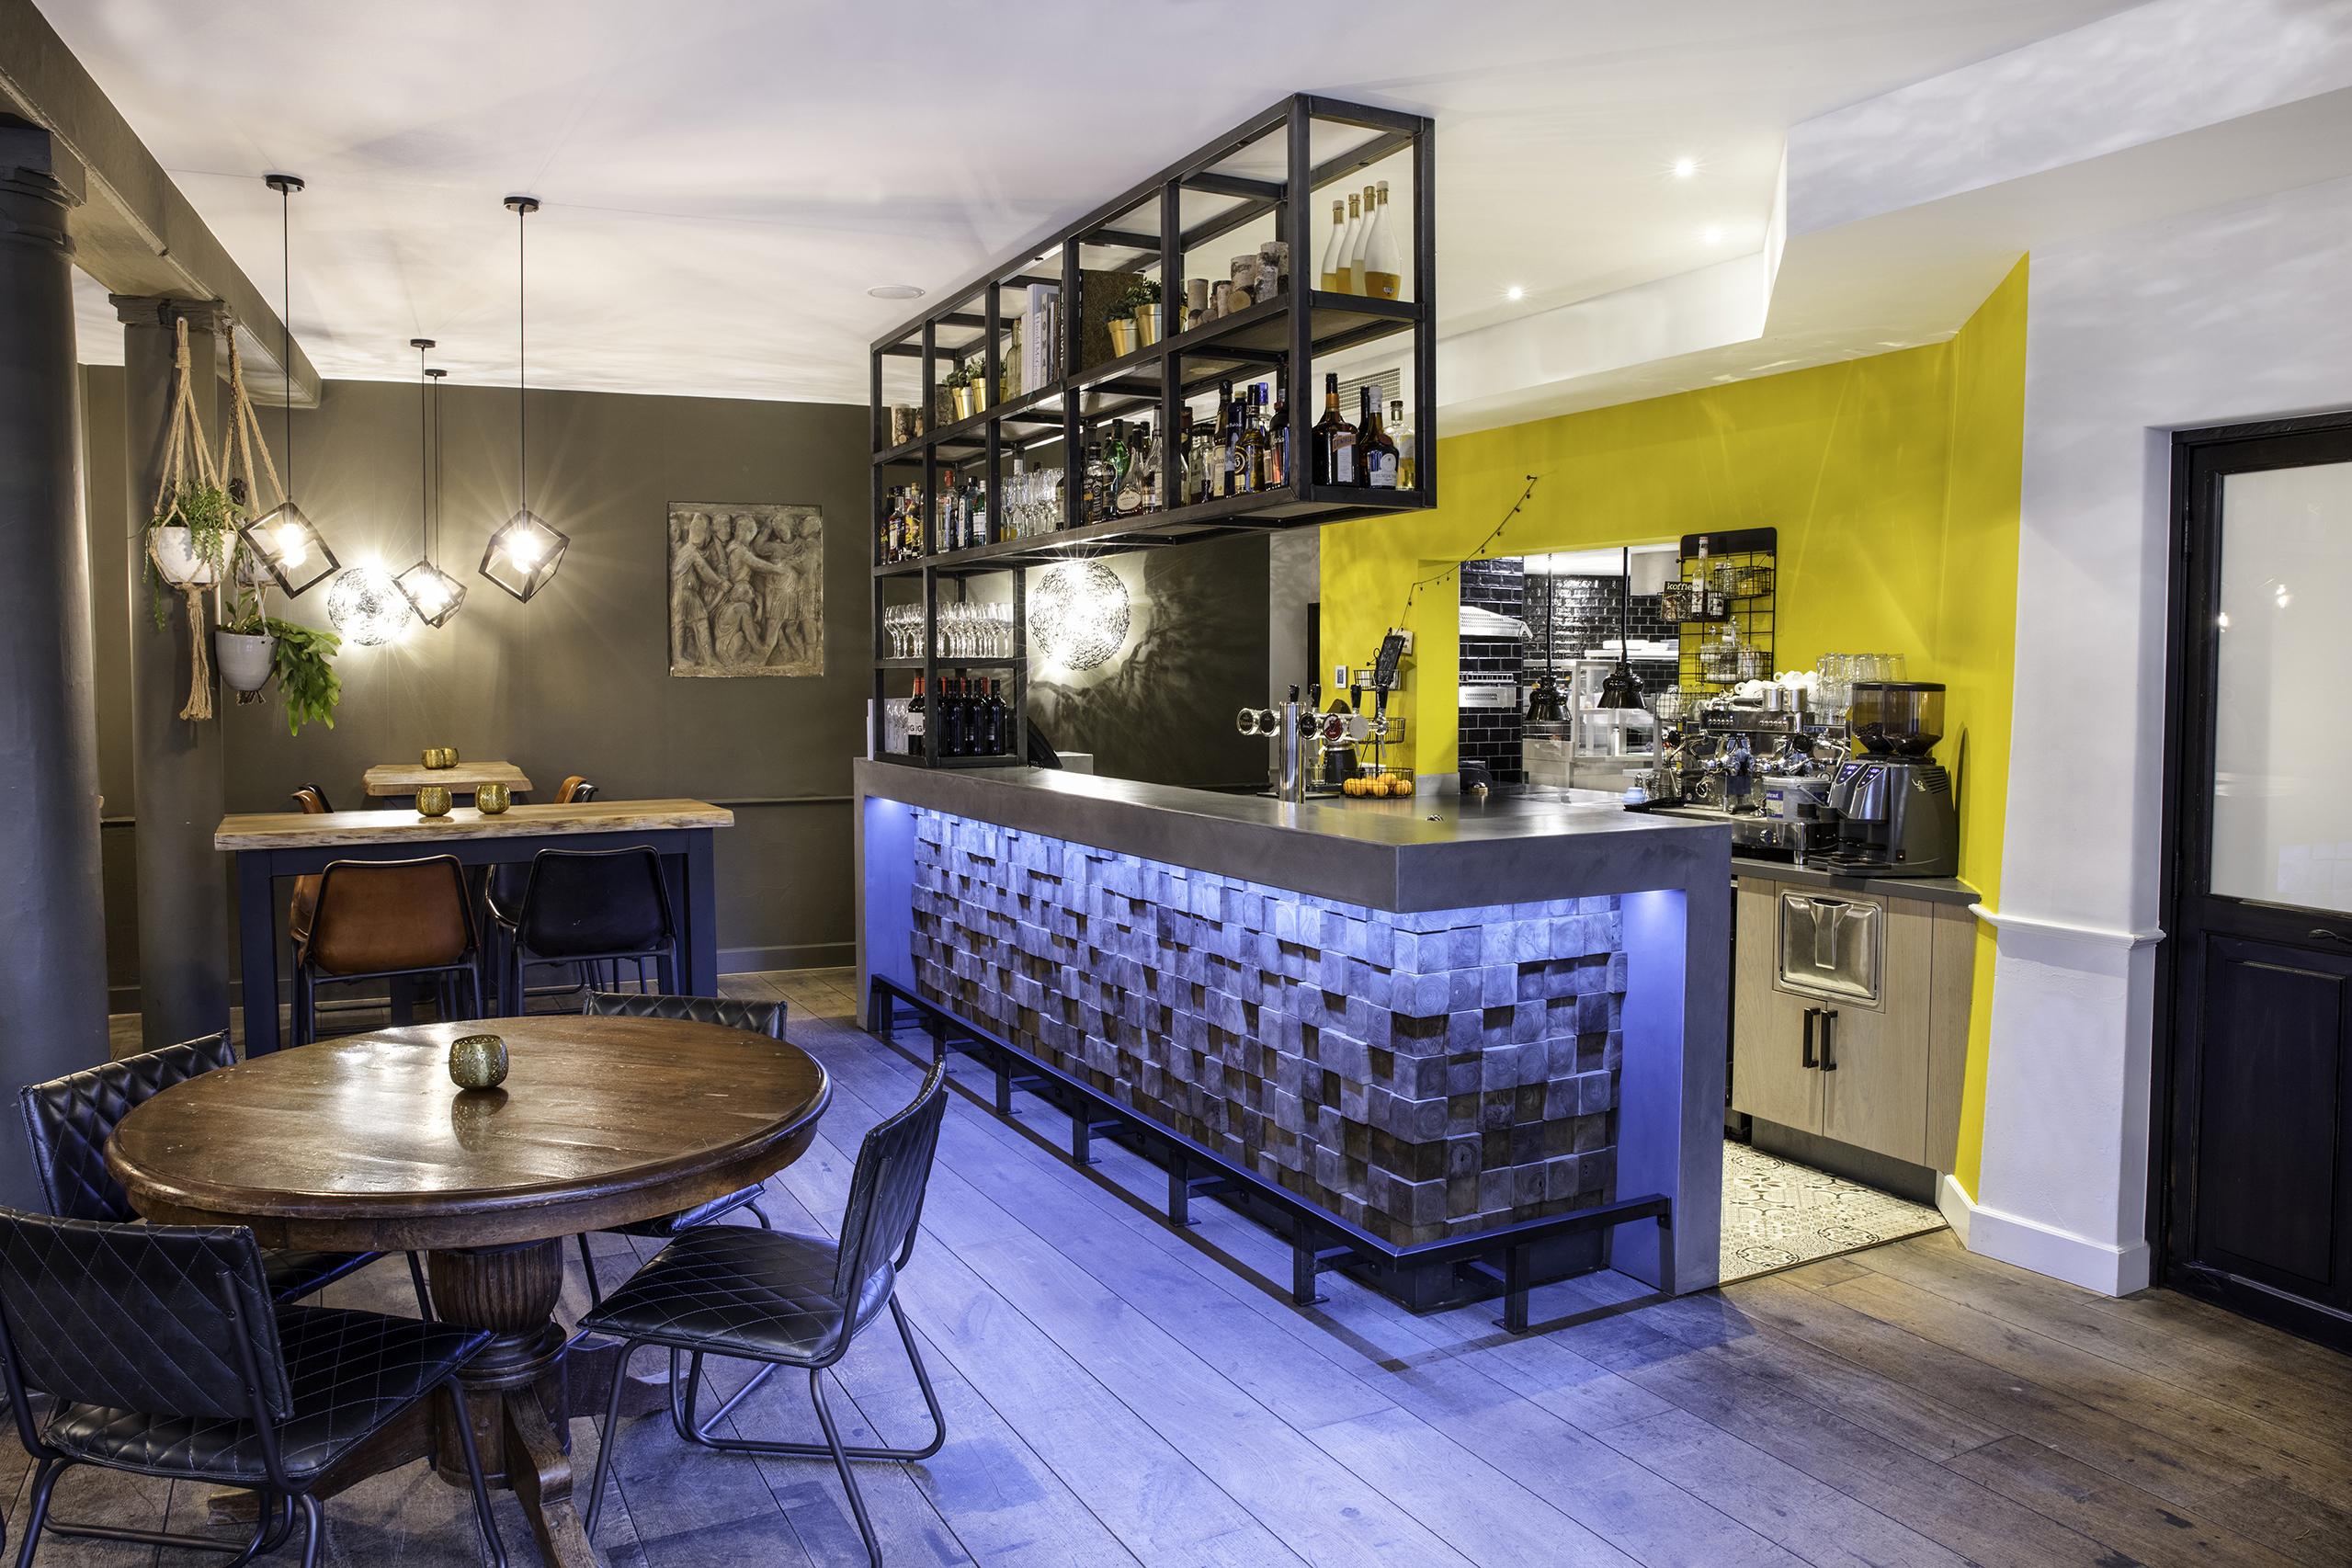 rietveld interieurbouw restaurant Brasserie Joia oudewater inrichting 3